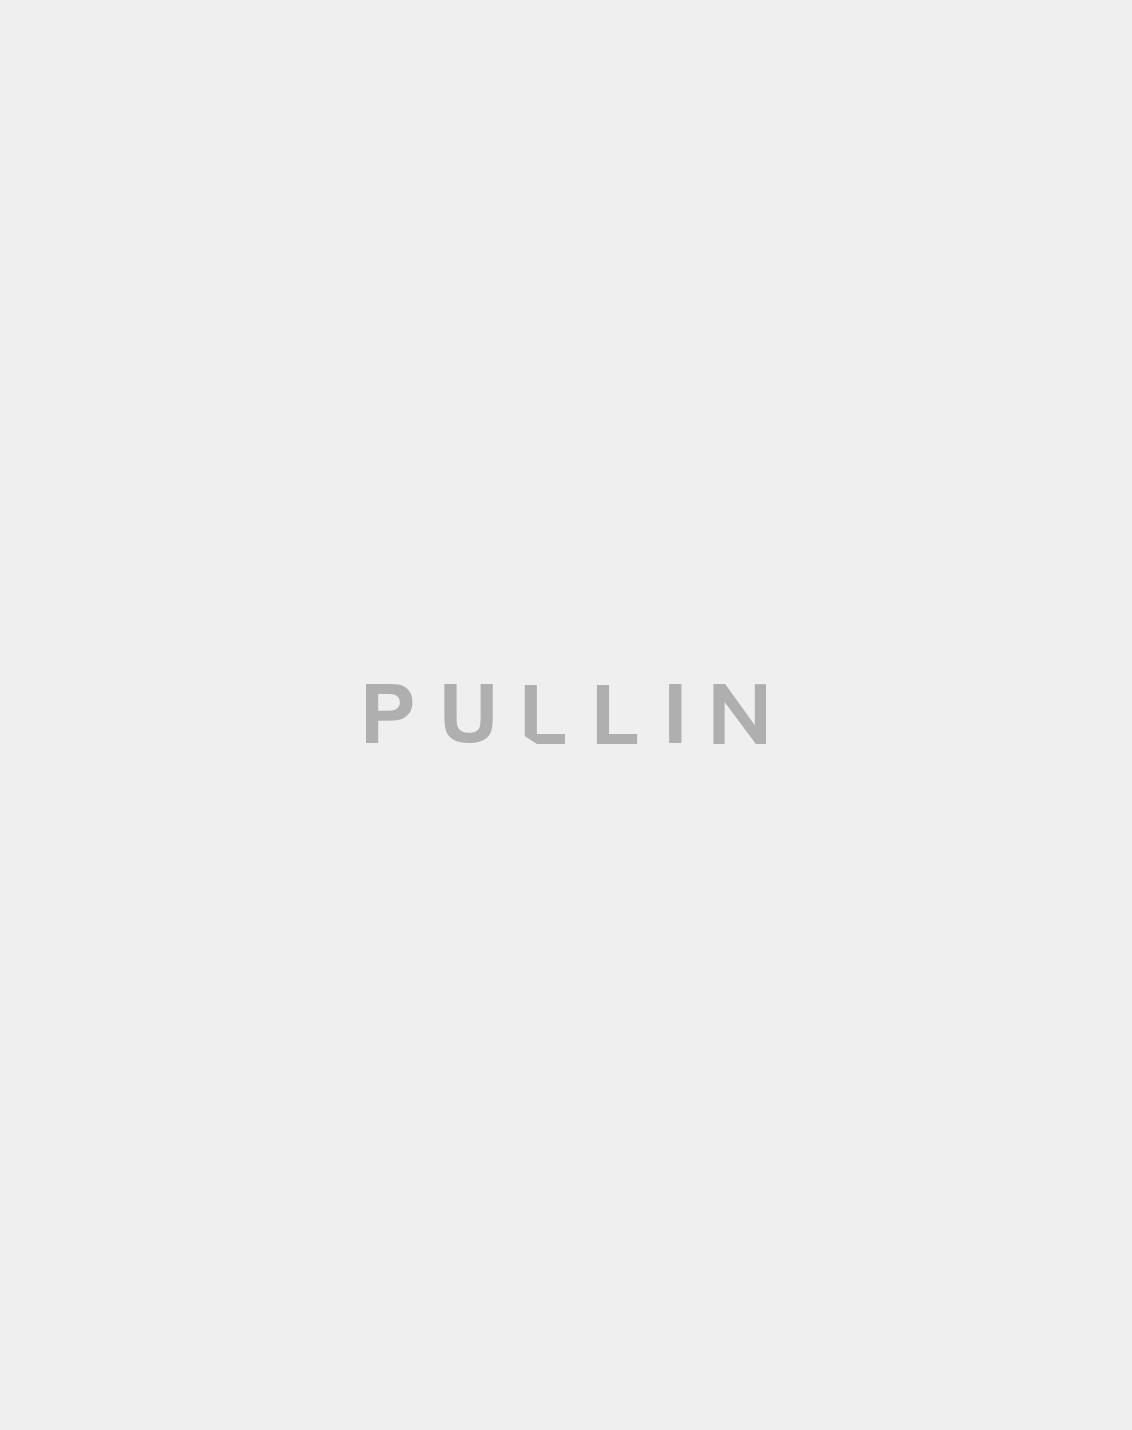 T-shirt cornelius homme - pull in 3